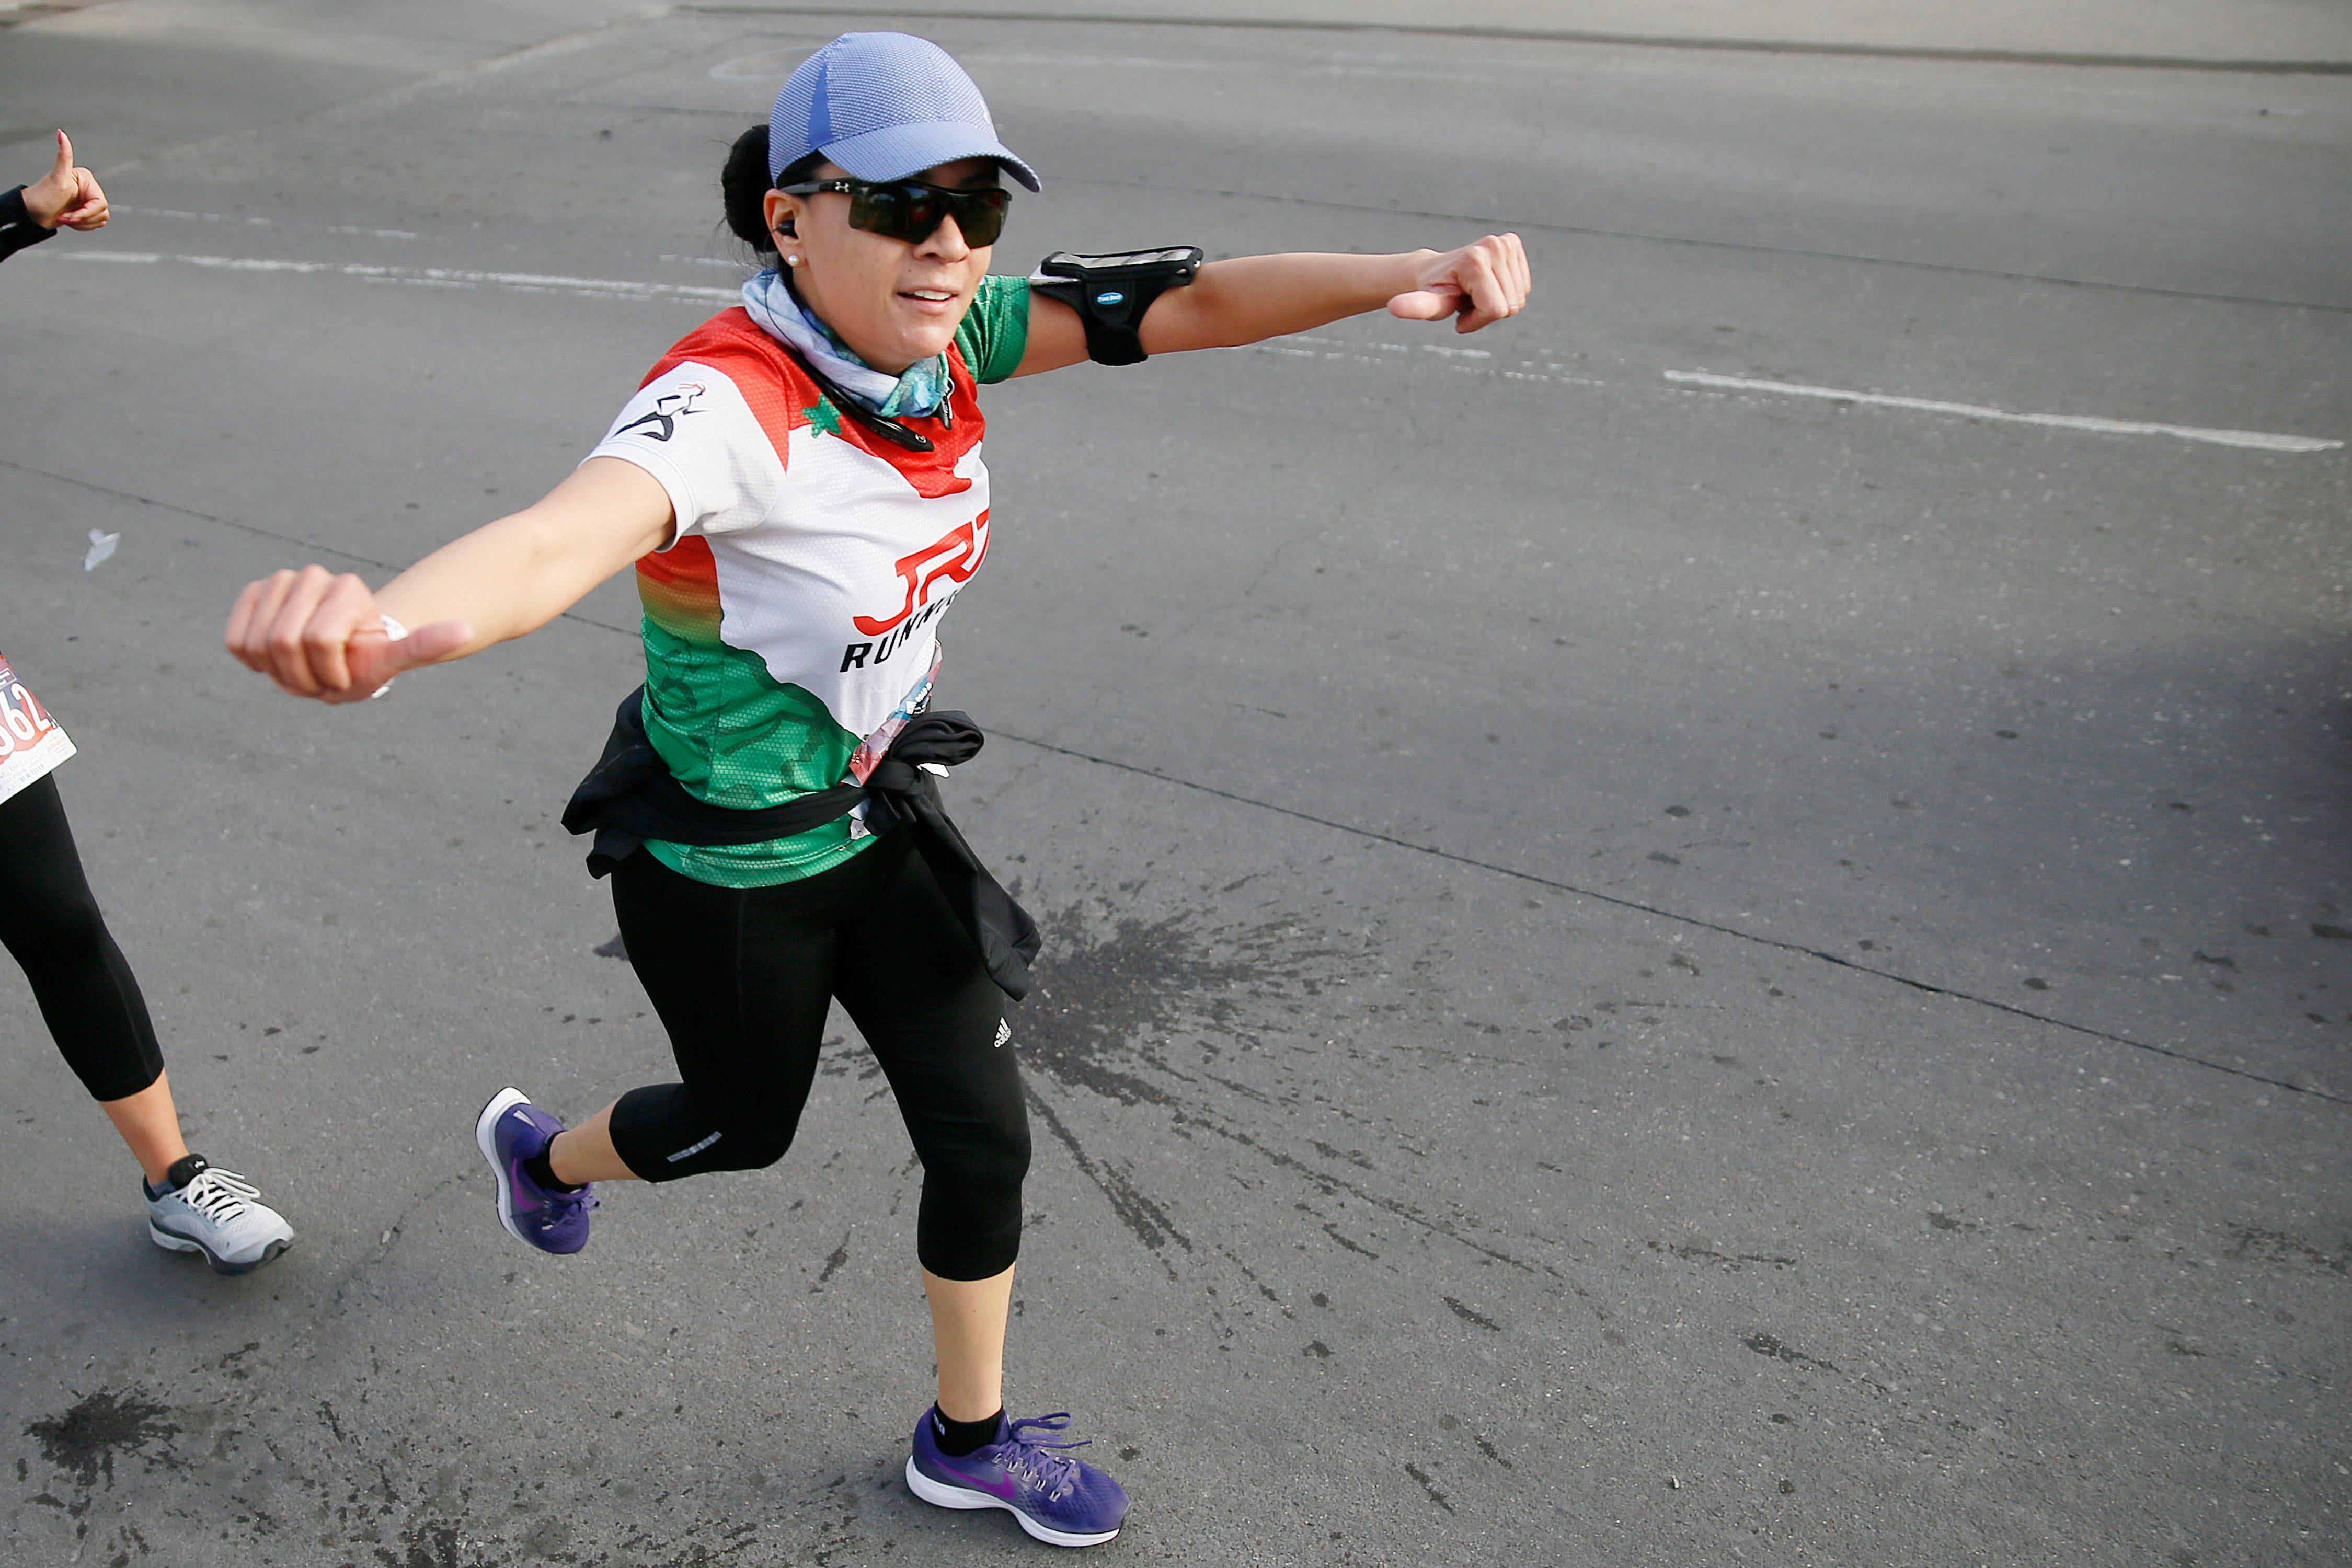 Run Internacional: The U.S. - Mexico 10K